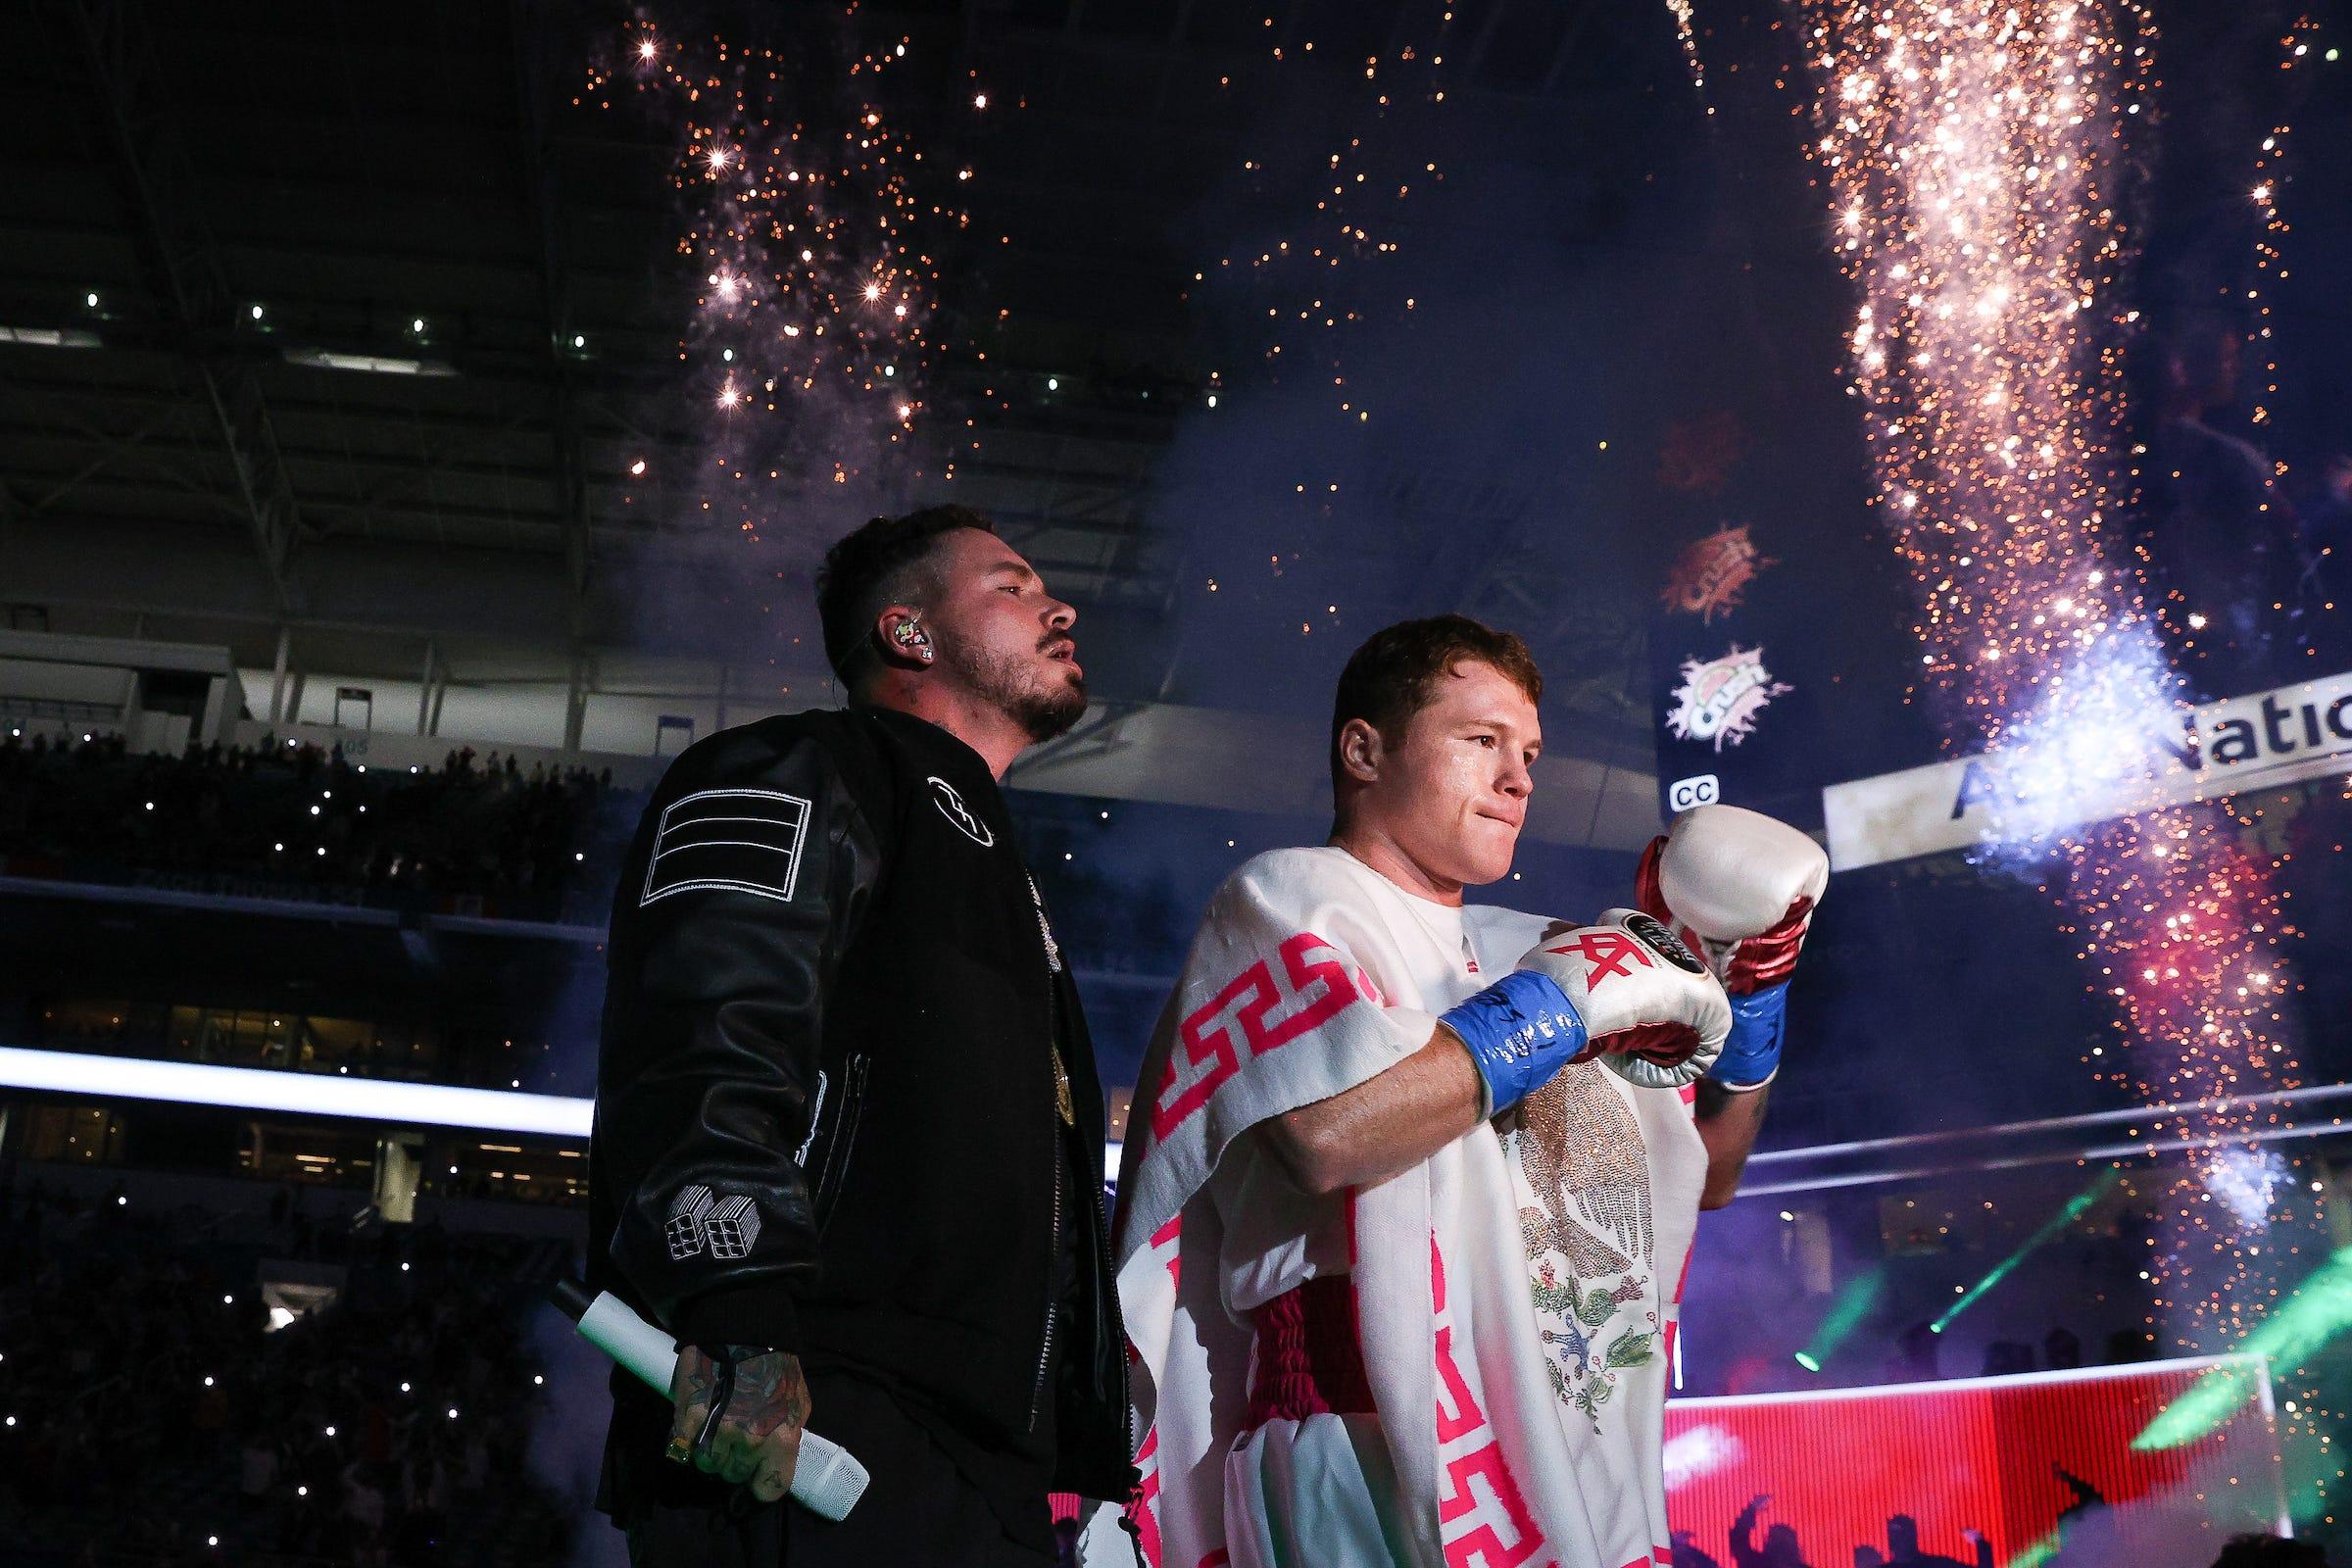 Canelo Alvarez Wins Easily, Miami Hosts Incredible Fight Night